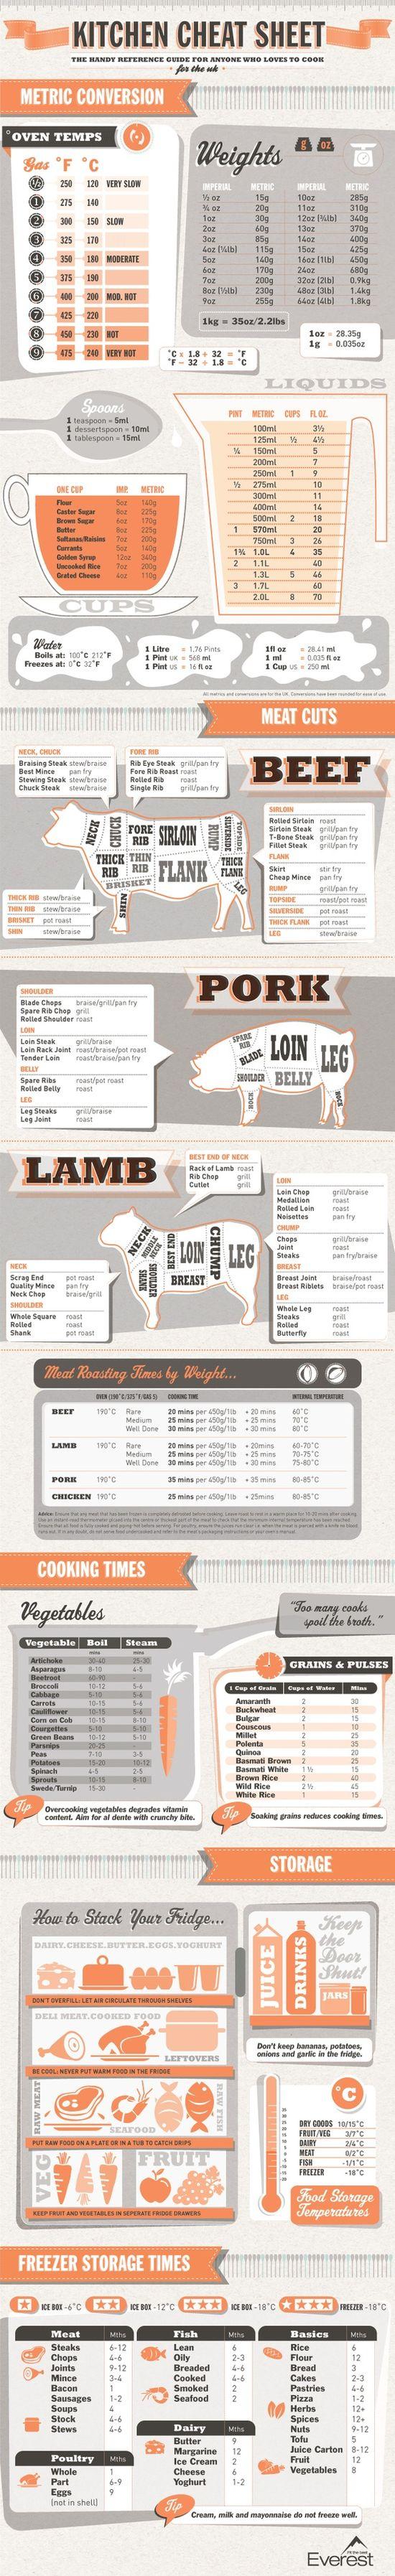 Kitchen Cheat Sheet - #kitchen #printable